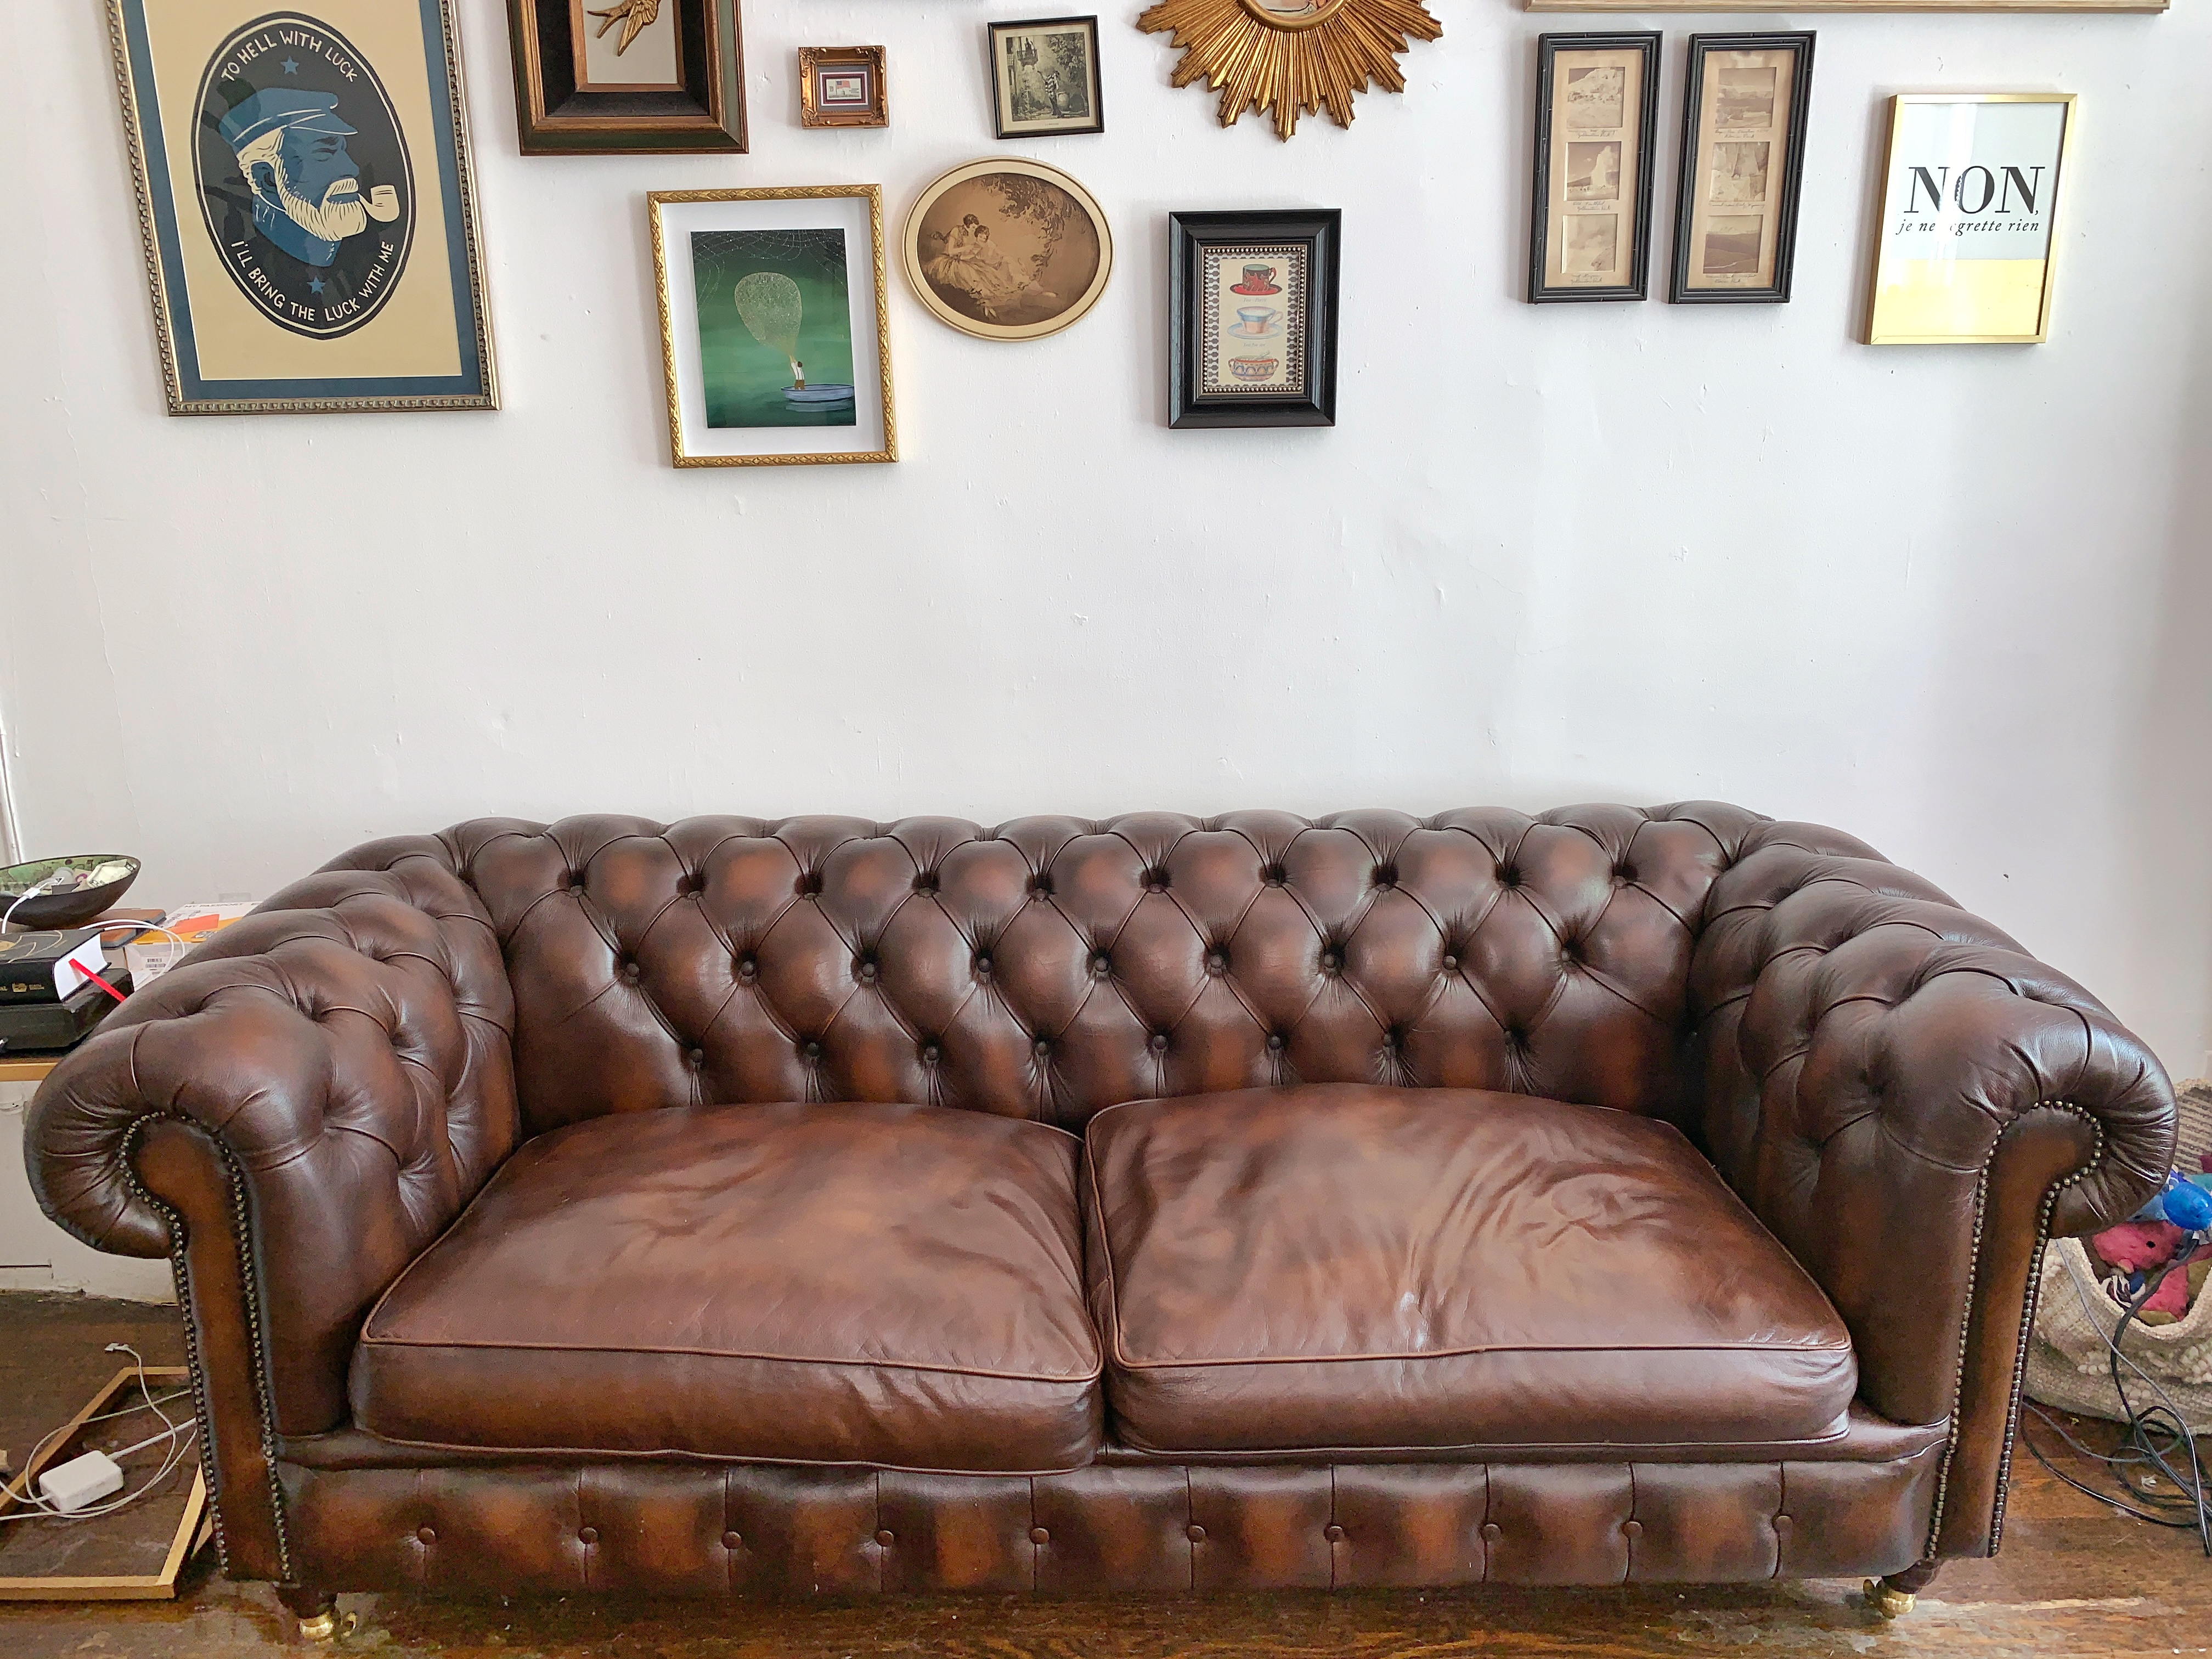 7 Delightful Sofas Available On Bazaar